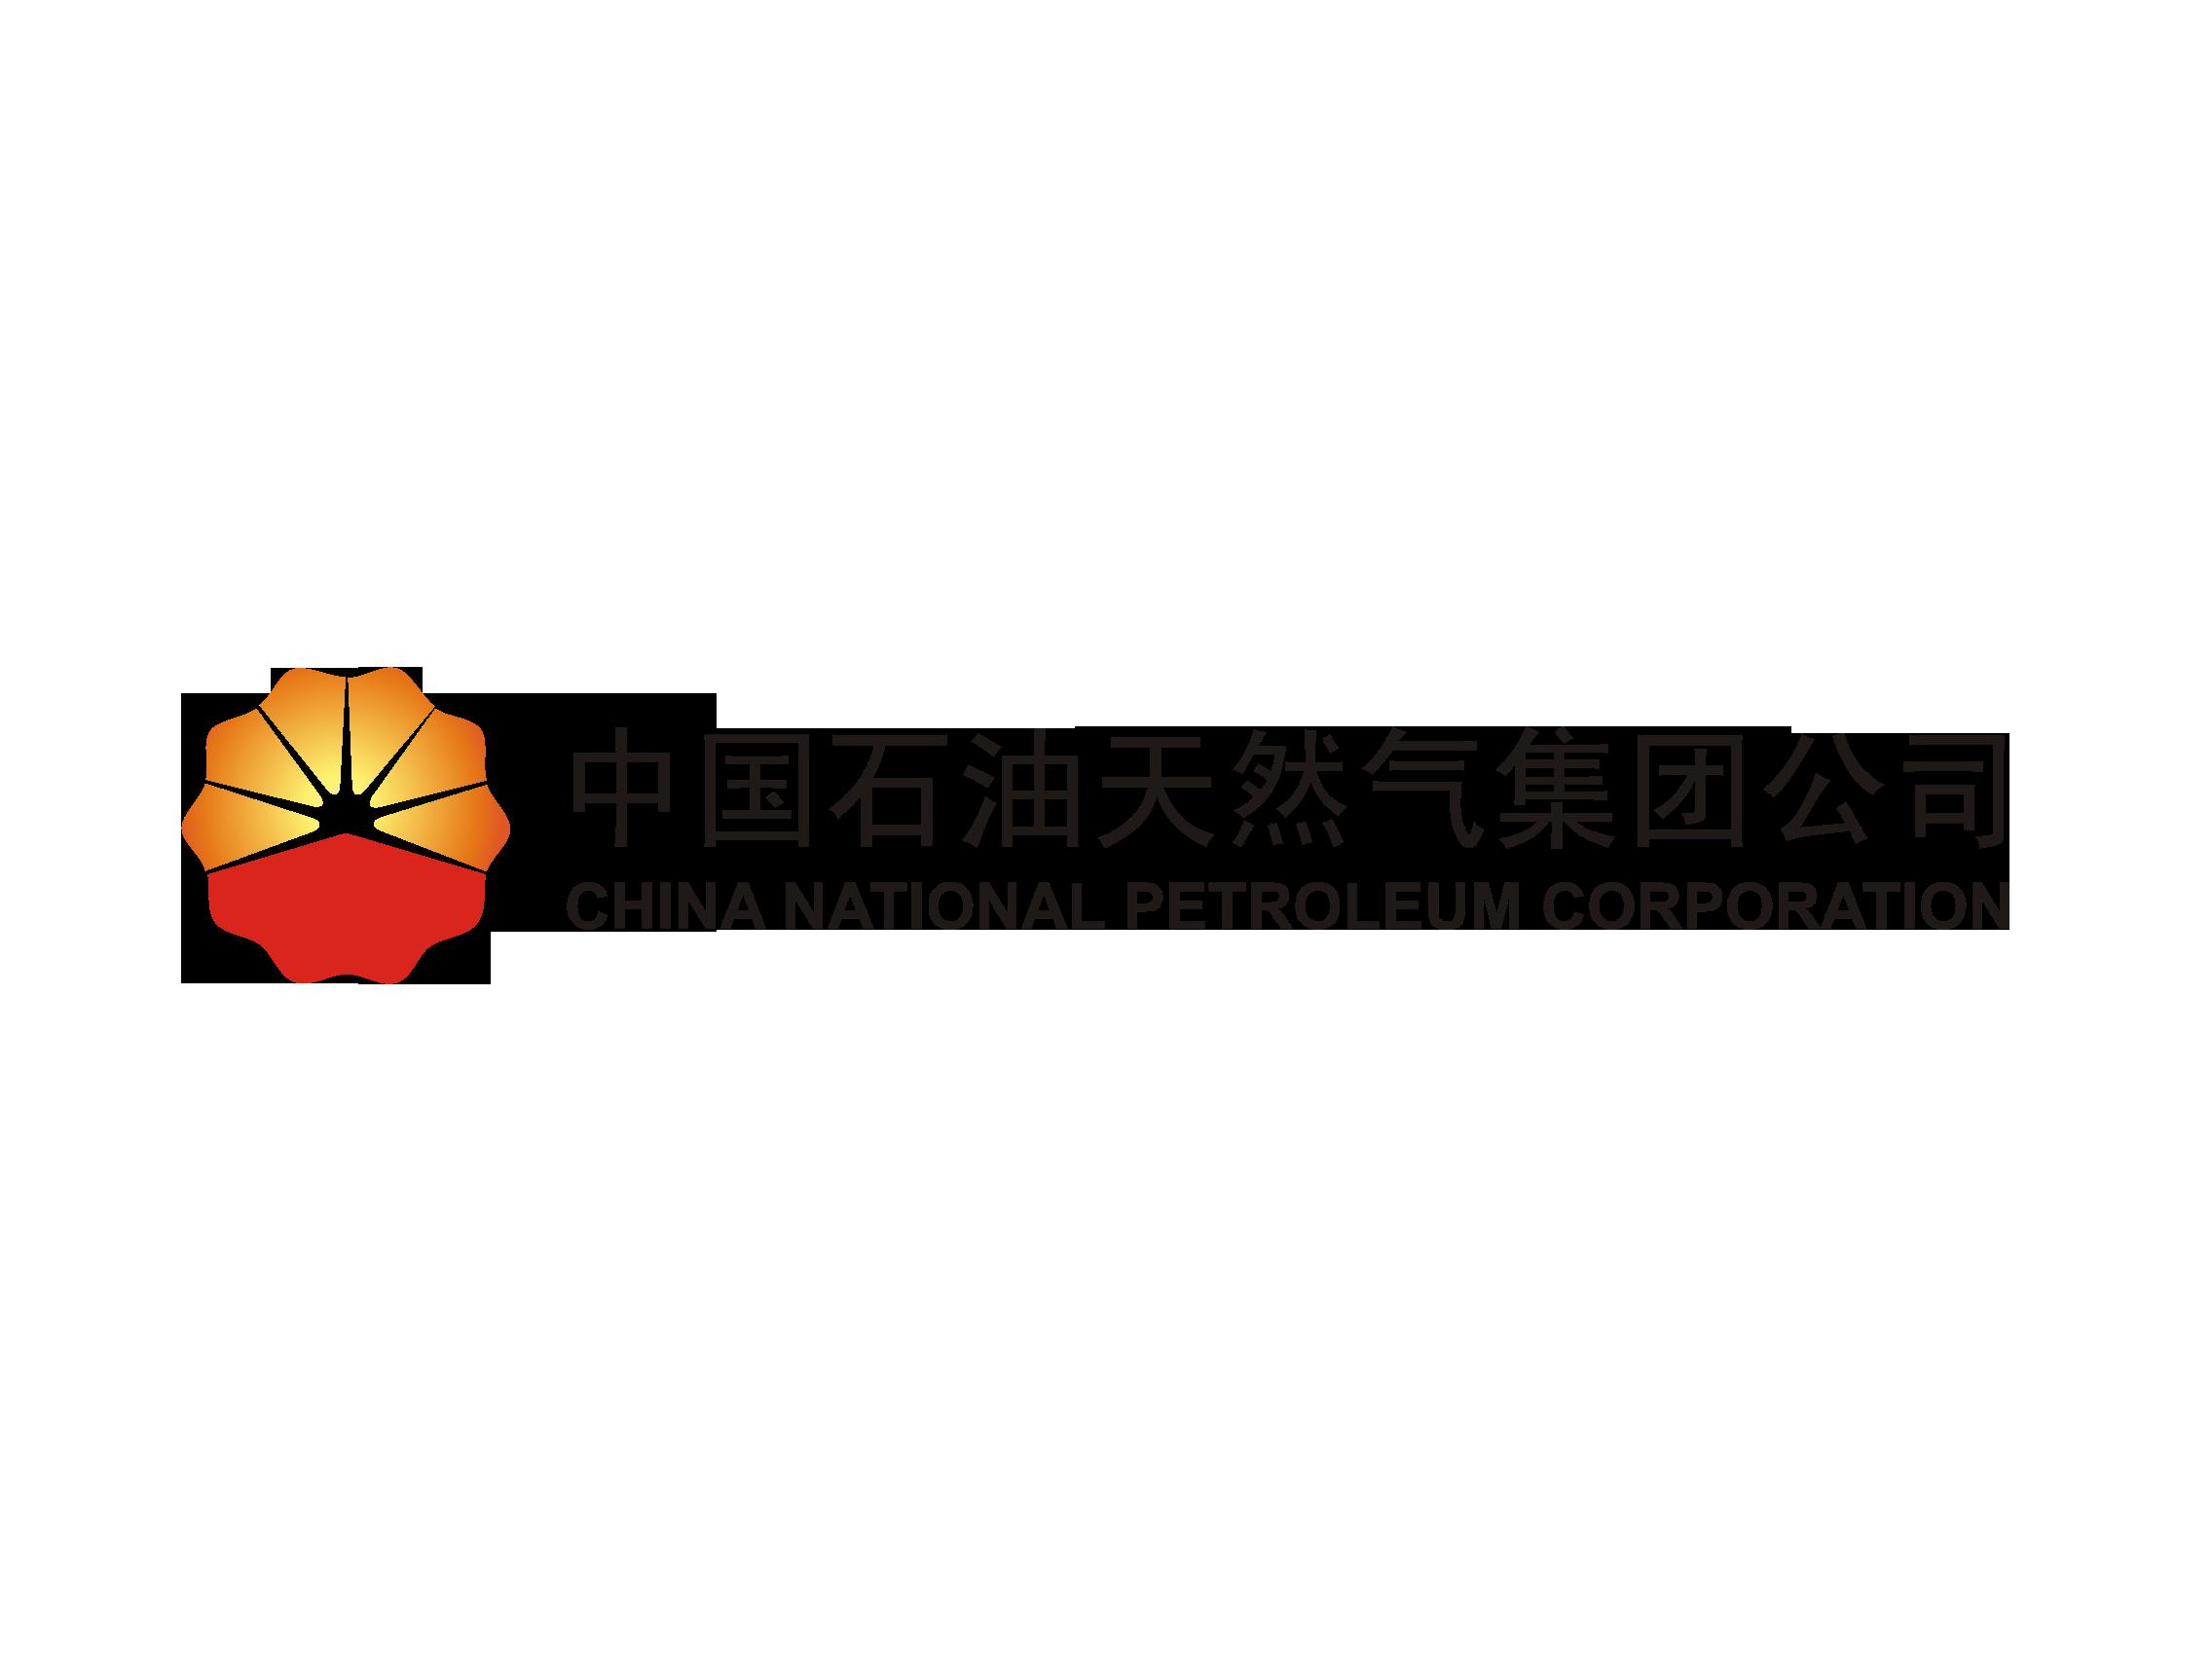 China National Petroleum PNG Free Background.